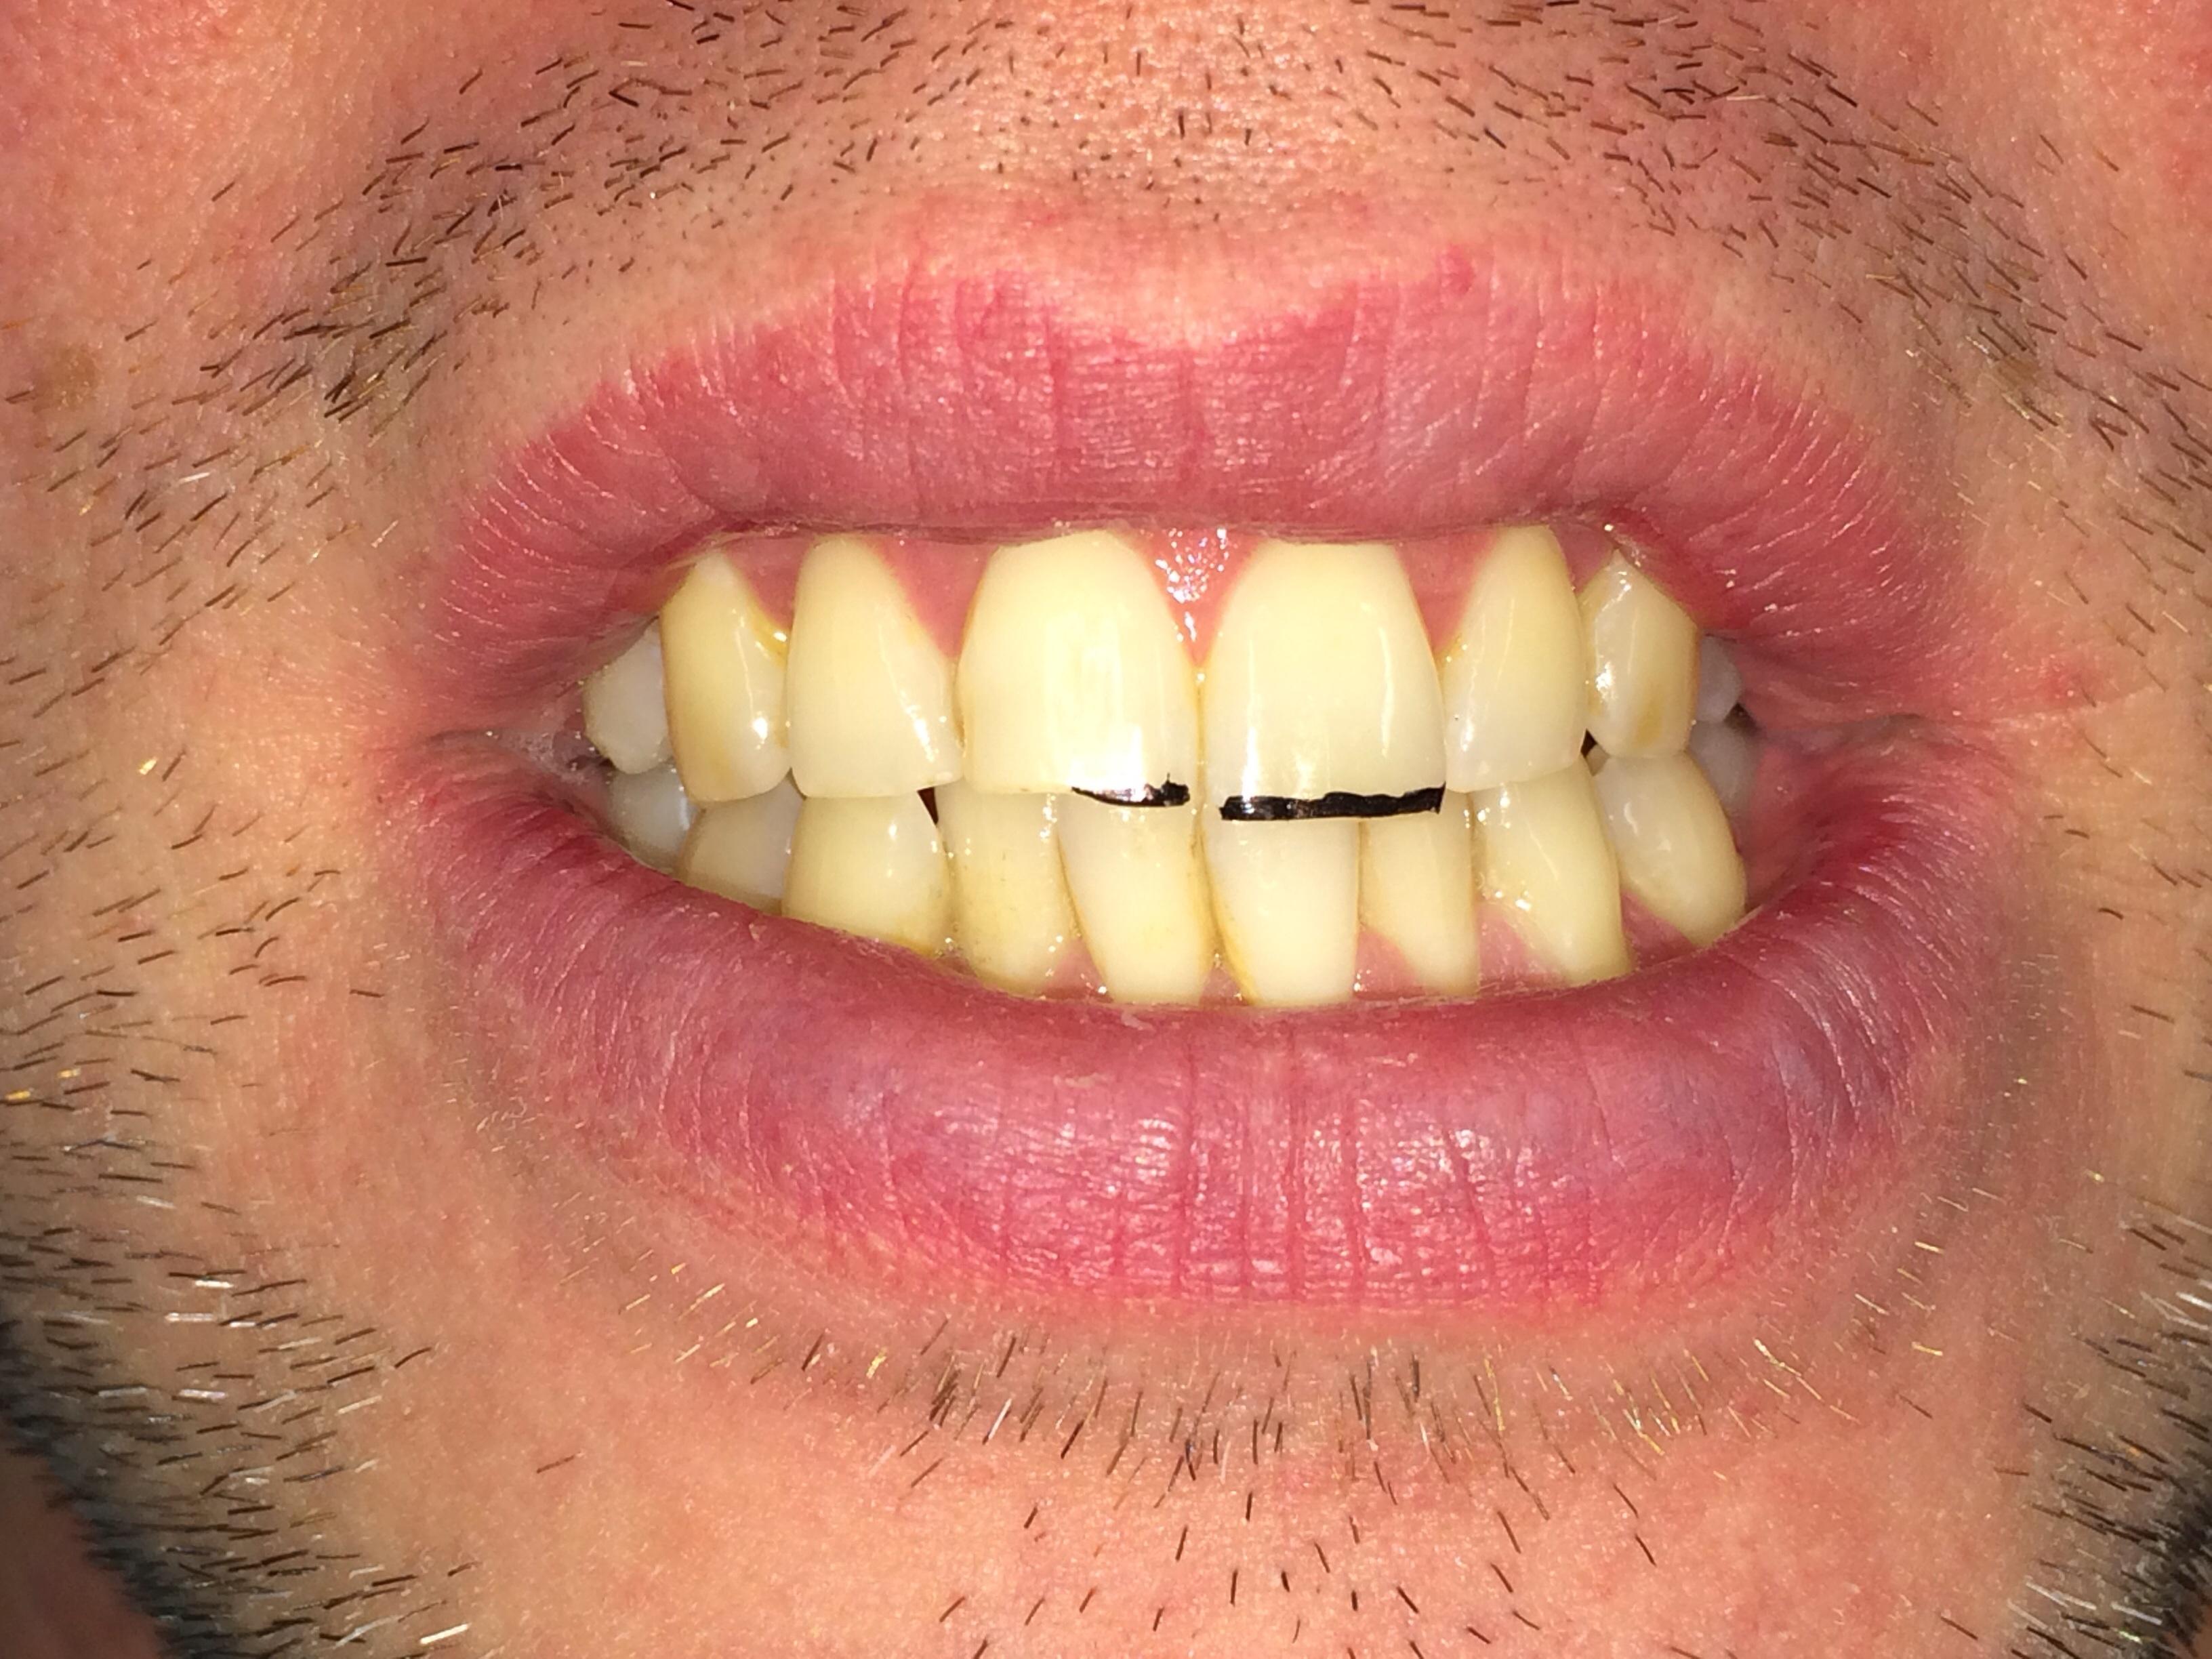 laga tand själv